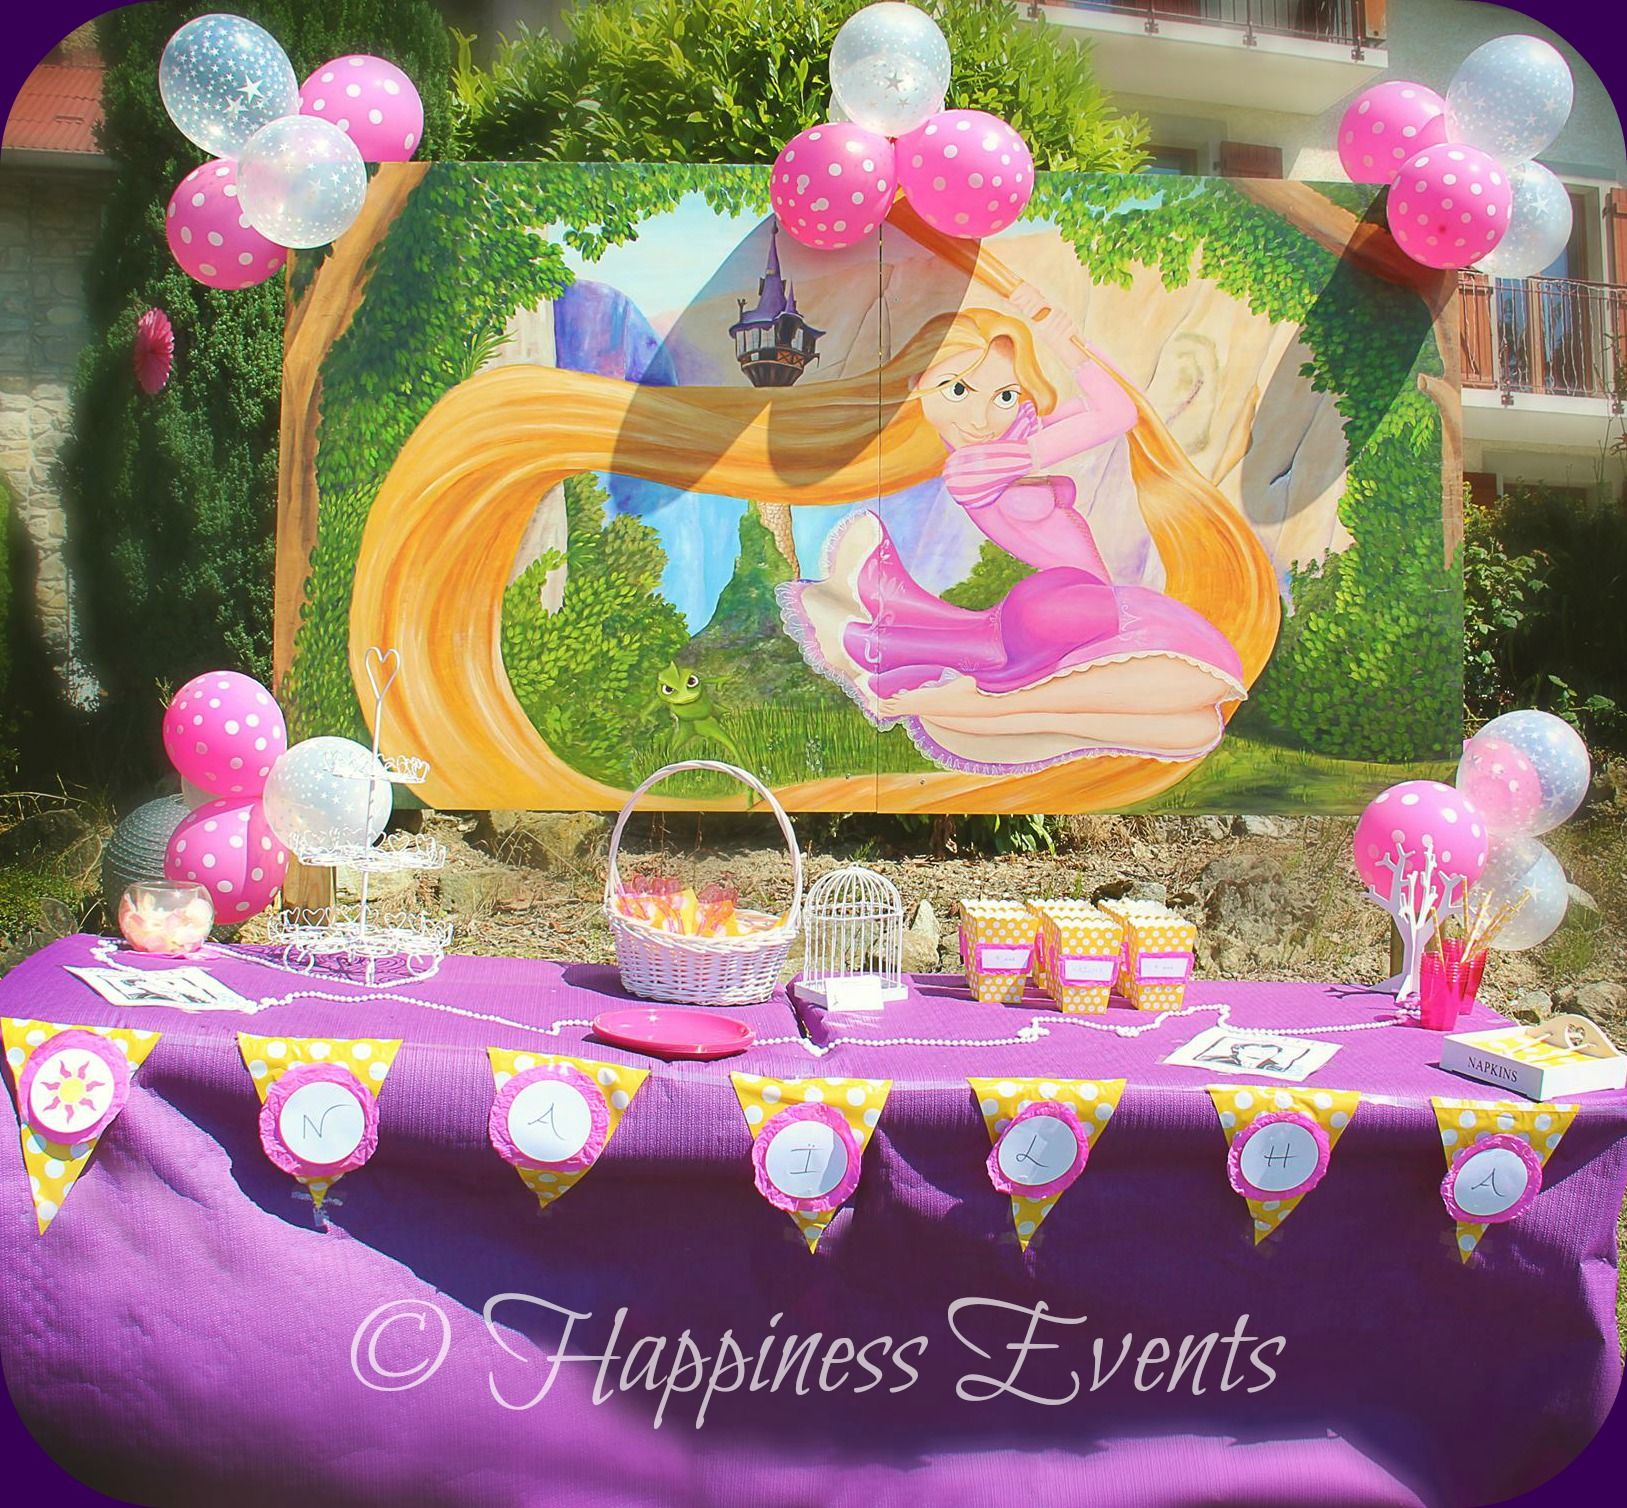 Anniversaire Theme Raiponce Www Happinessevents Net Anniversaire Theme Raiponce Anniversaire Raiponce Raiponce